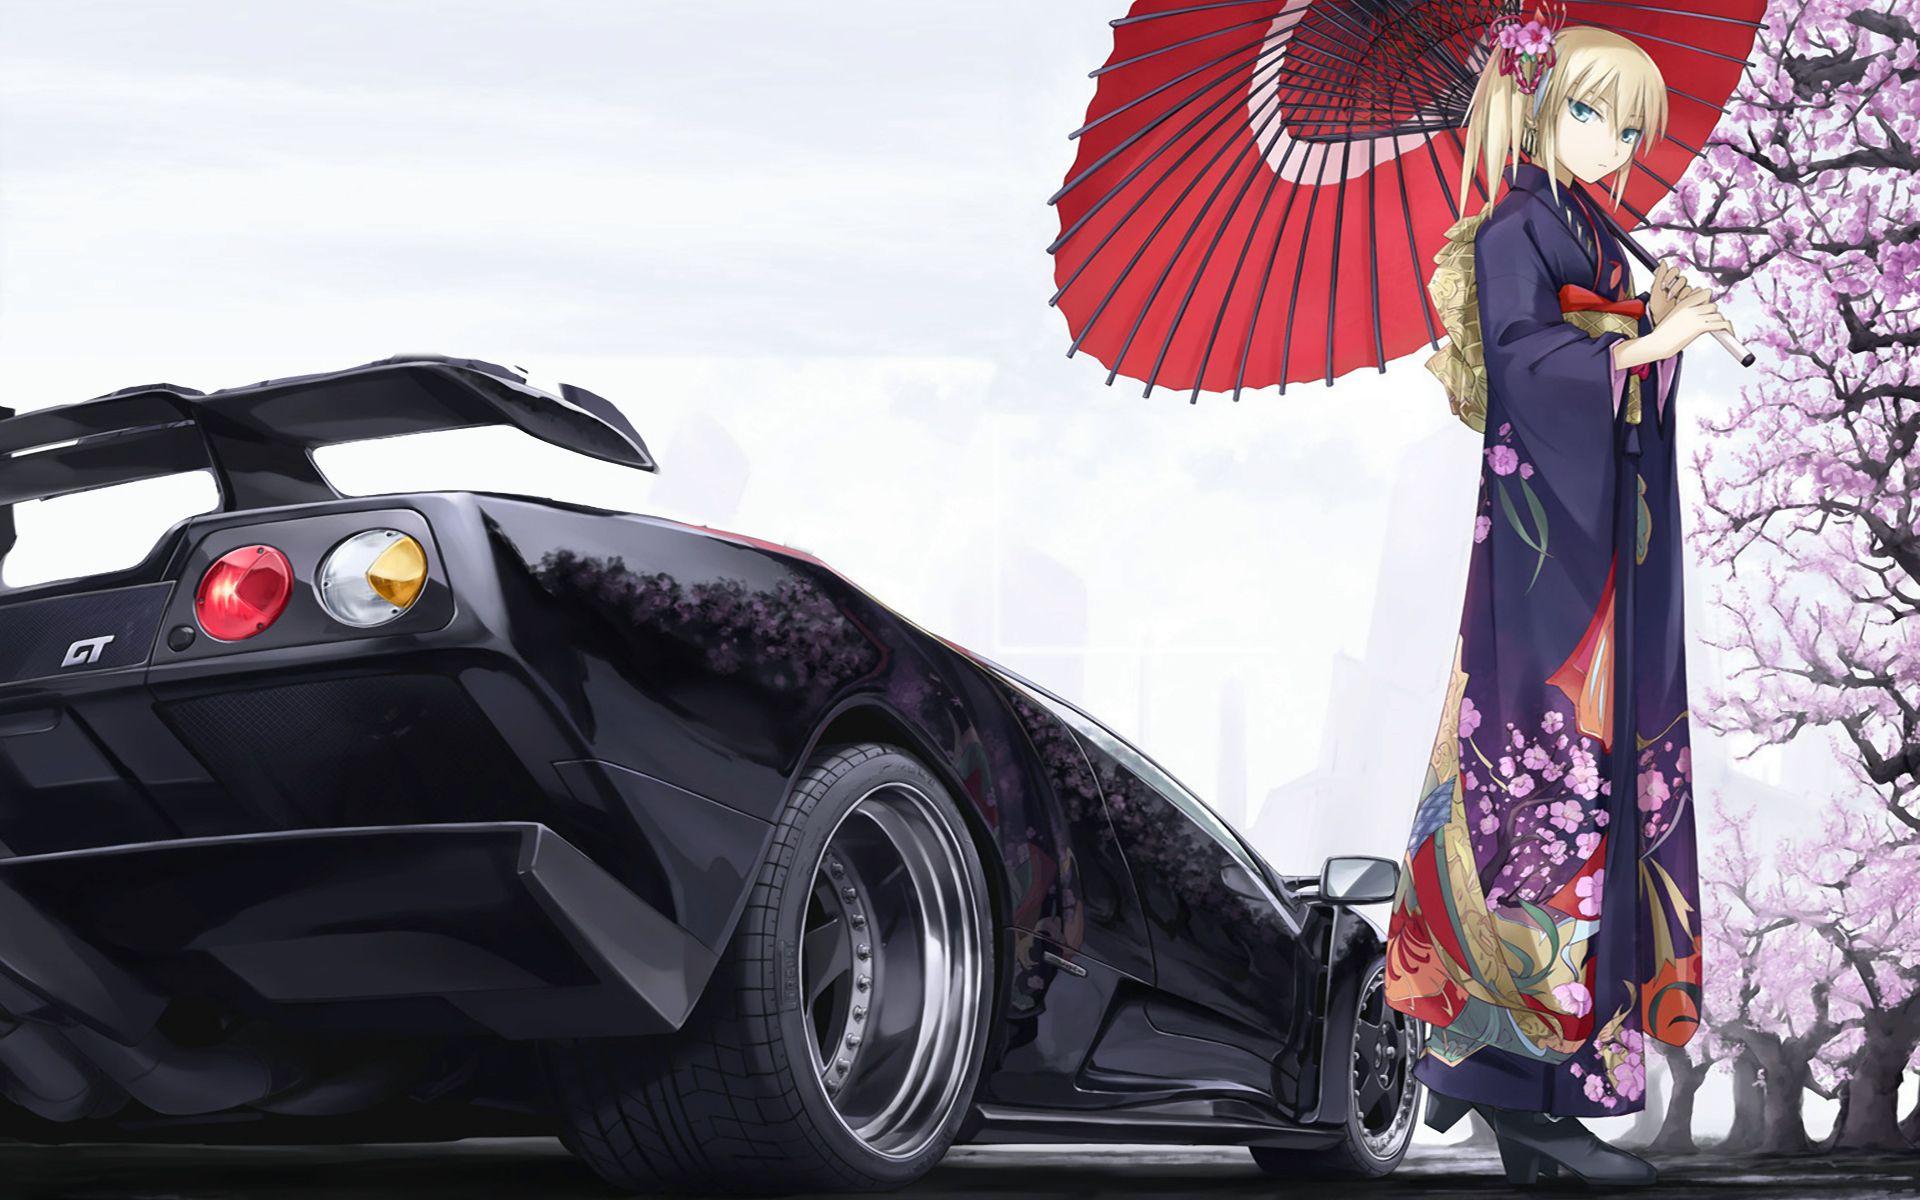 Download wallpaper car, girl, sakura, ferrari gt, anime